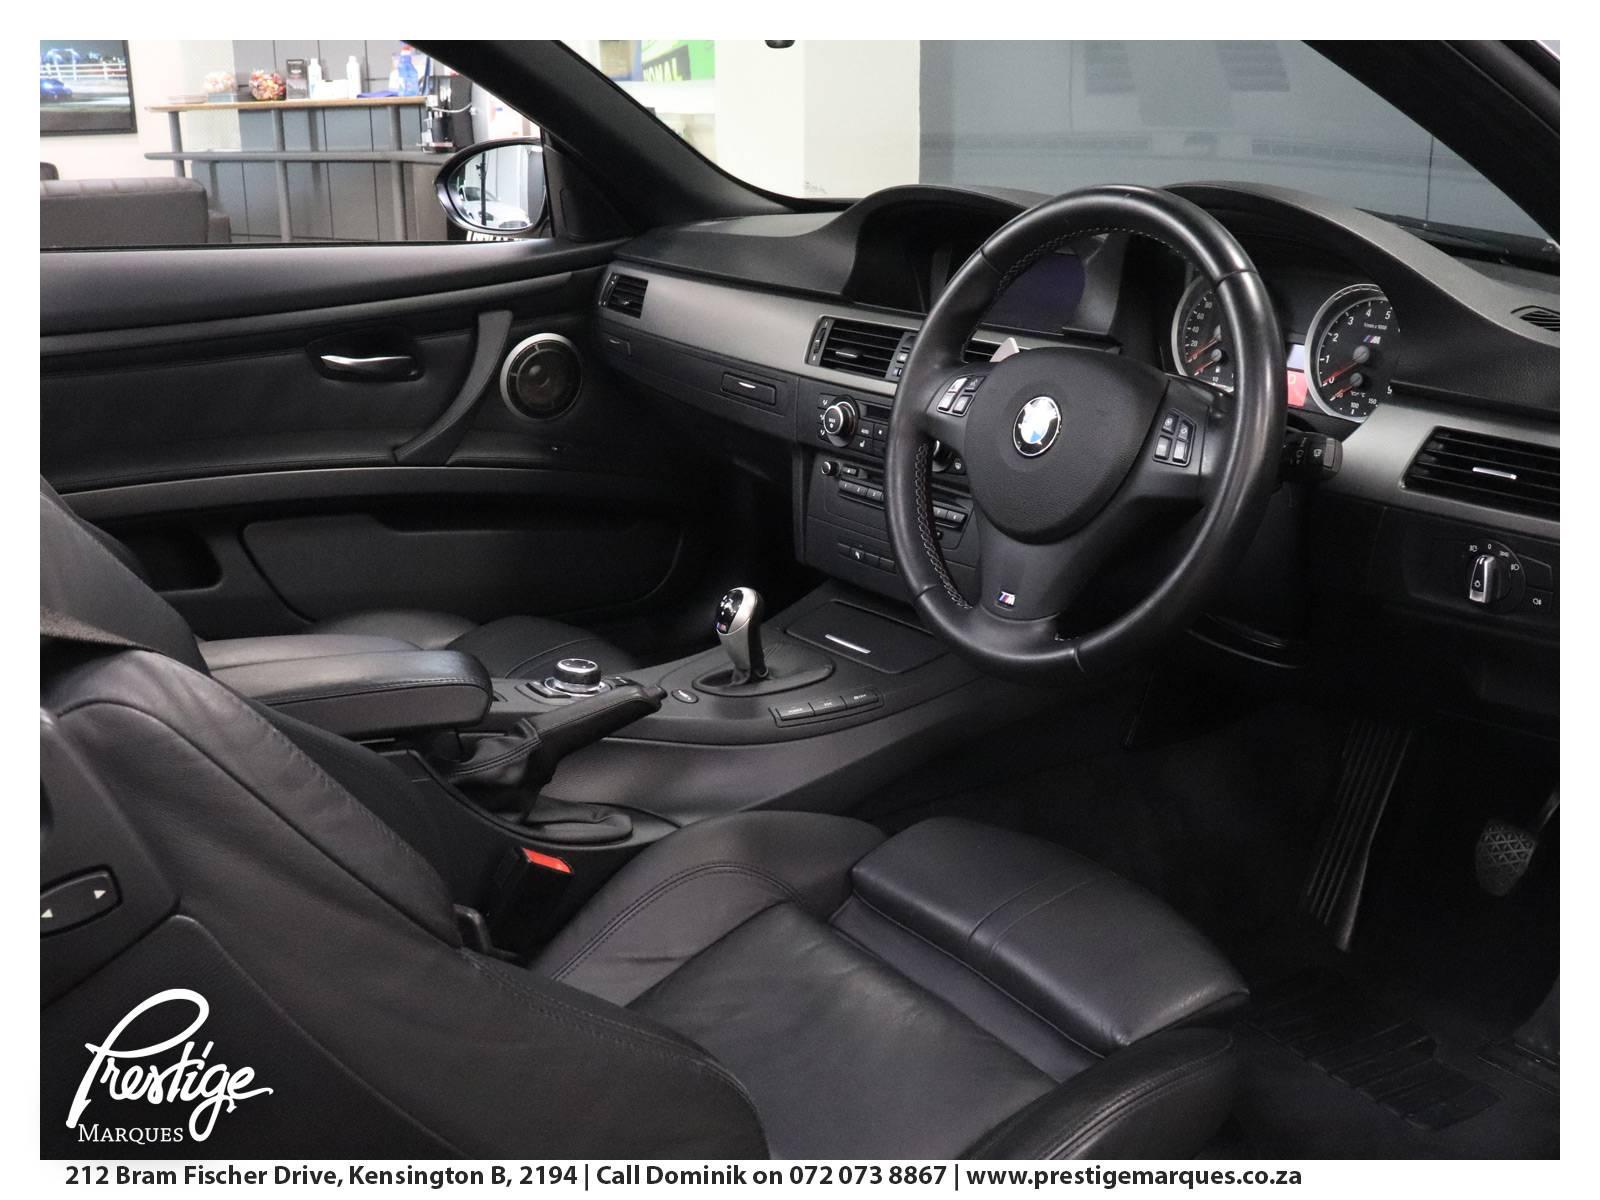 2012-BMW-M3-Prestige-Marques-Randburg-Santon-22